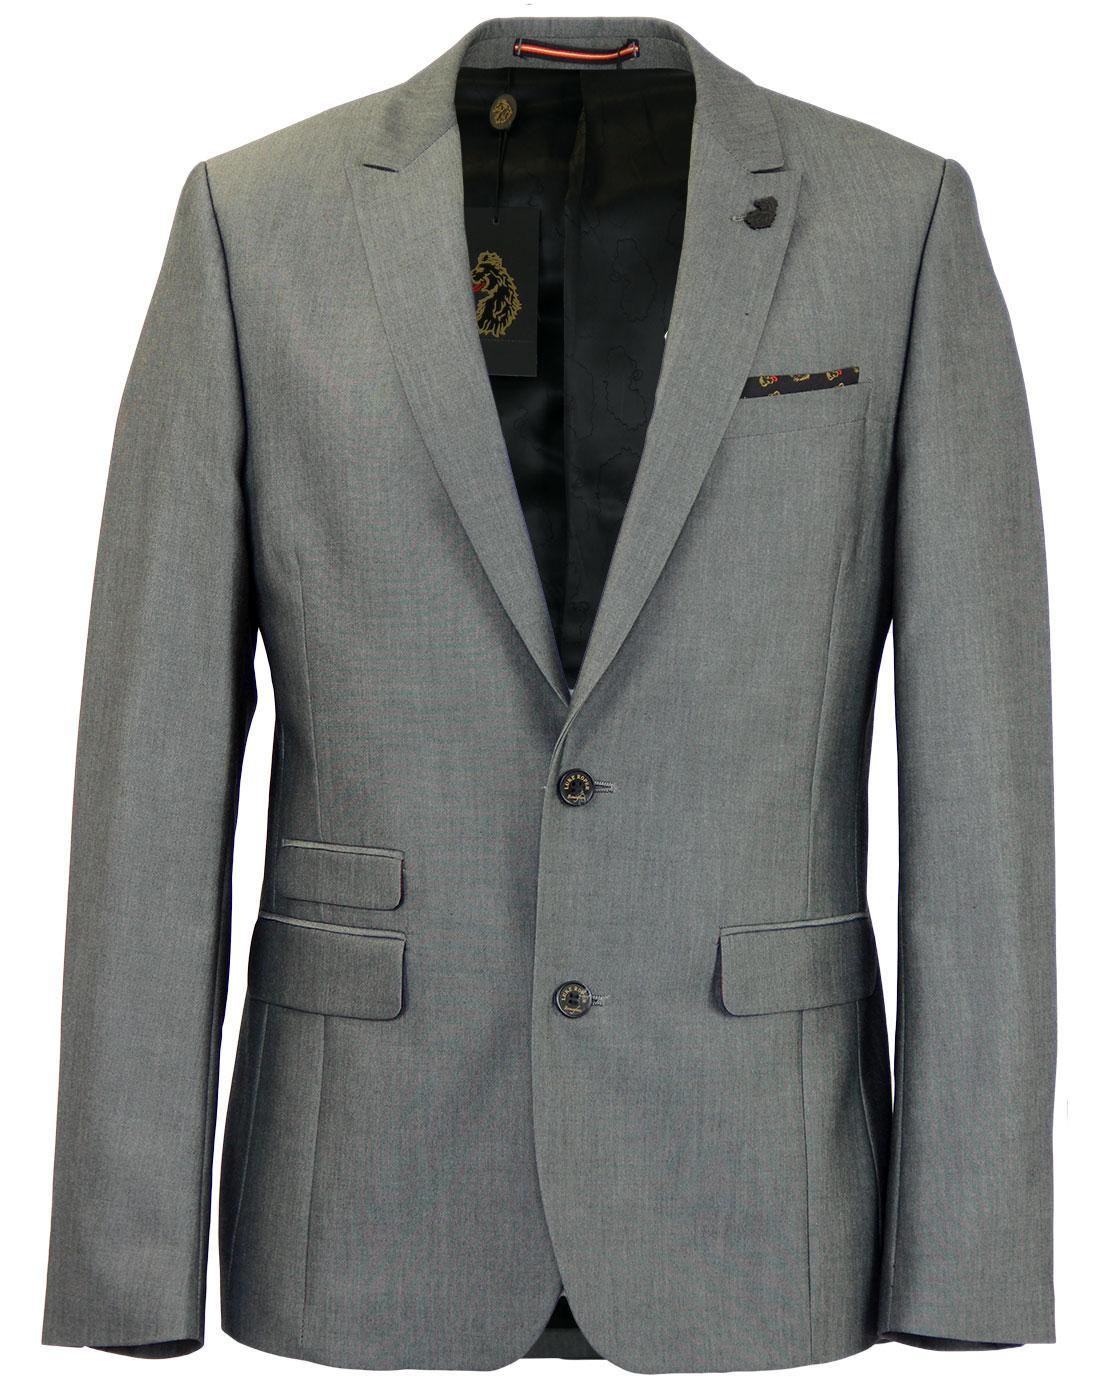 LUKE ROPER Guilty Retro Mod 2 Button Tailored Suit Jacket Grey 95694a50c